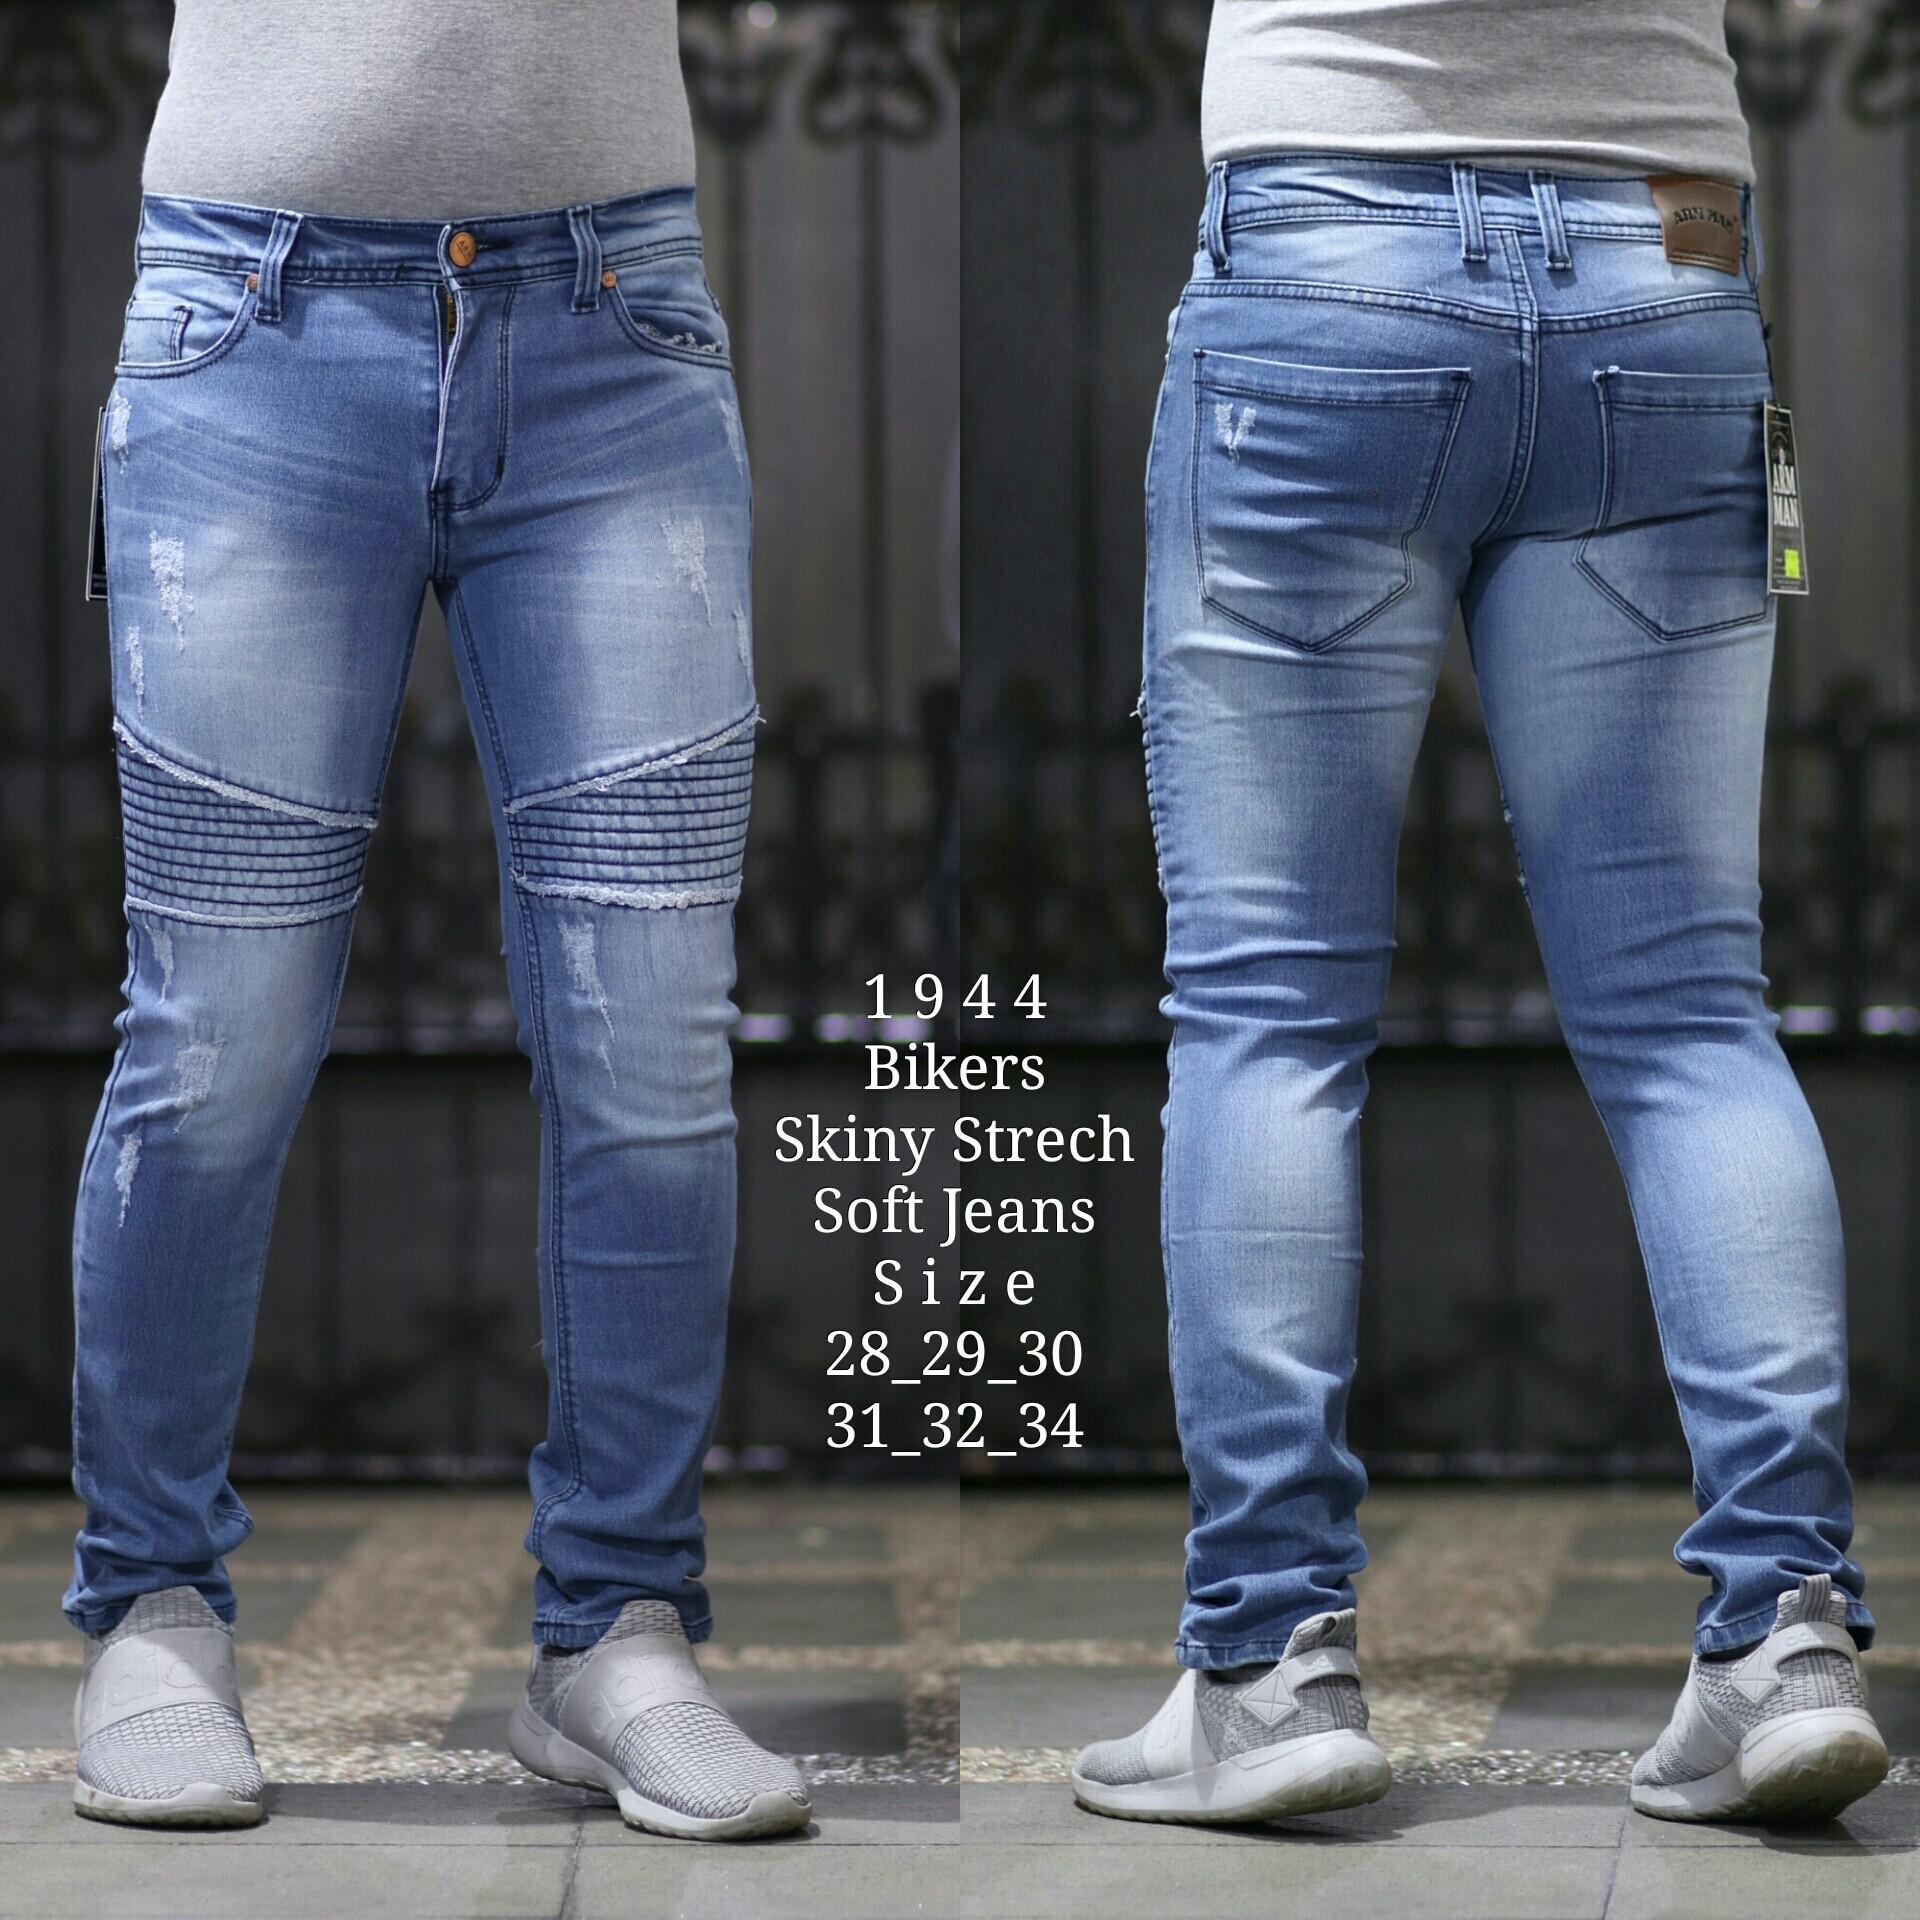 Celana Jeans Biker Stretch Pria/Celana Skinny/Slimfit Premium